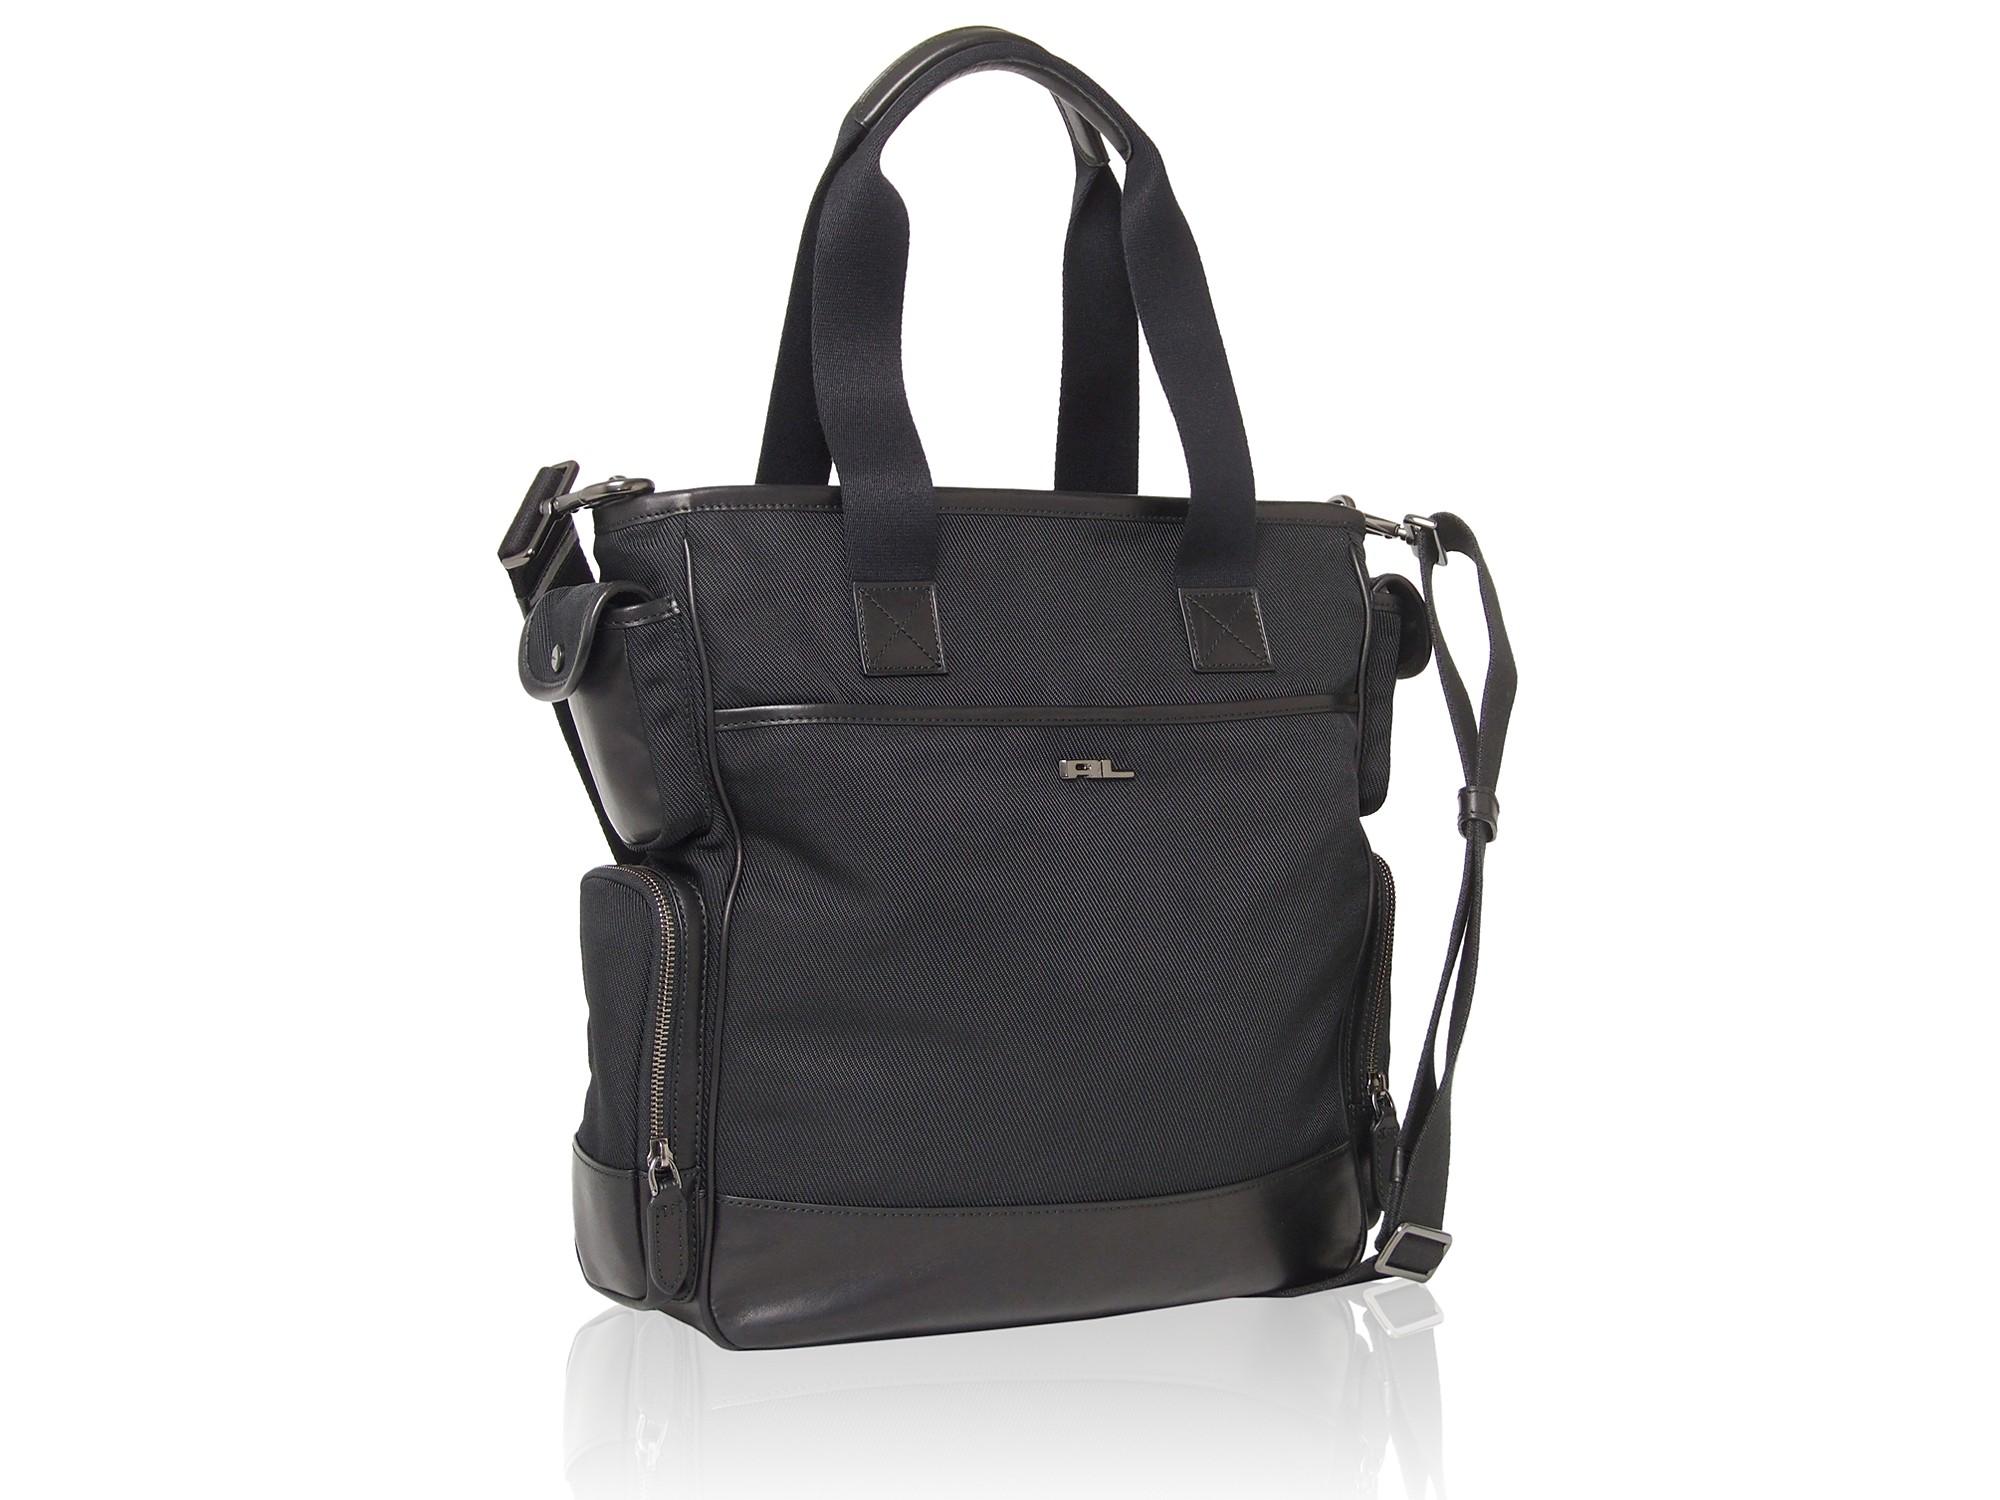 4fd76ee5196b Lyst - Ralph Lauren Black Label Nylon Tote Bag in Black for Men